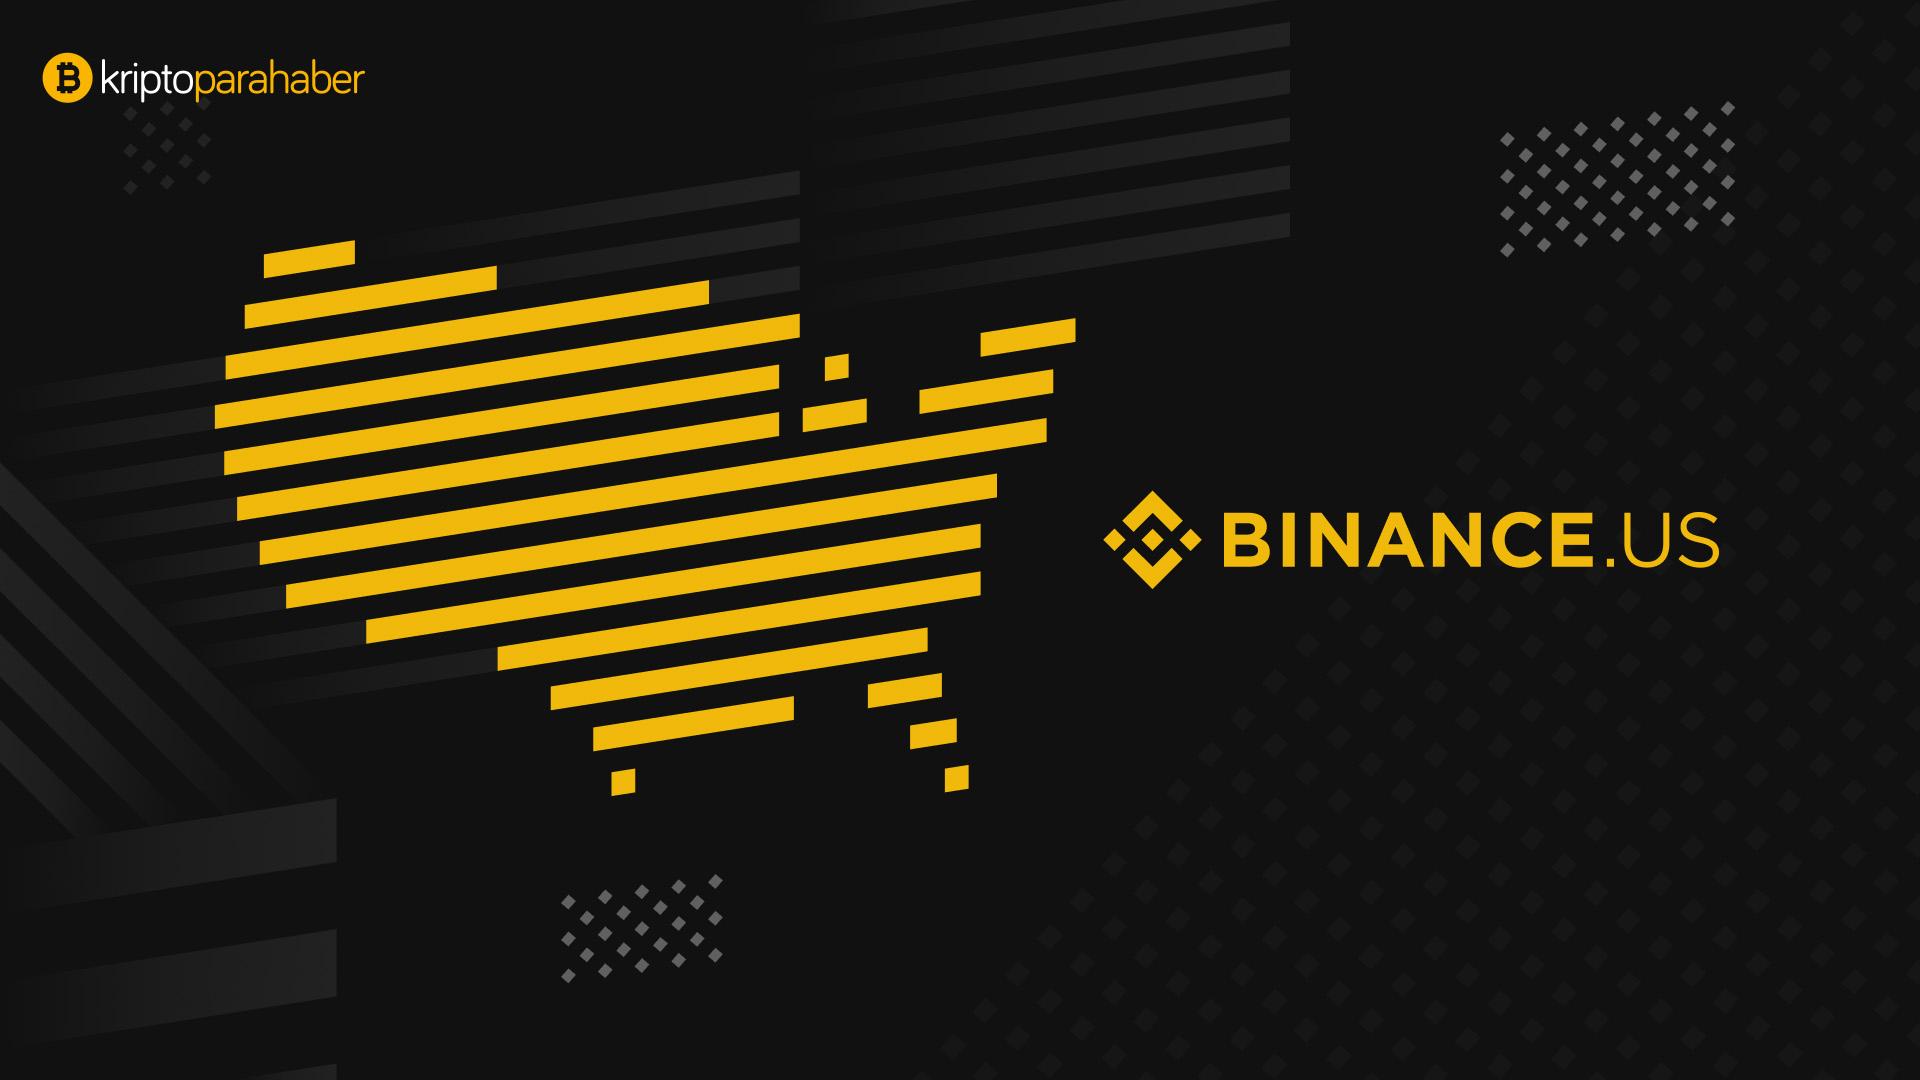 binance.us